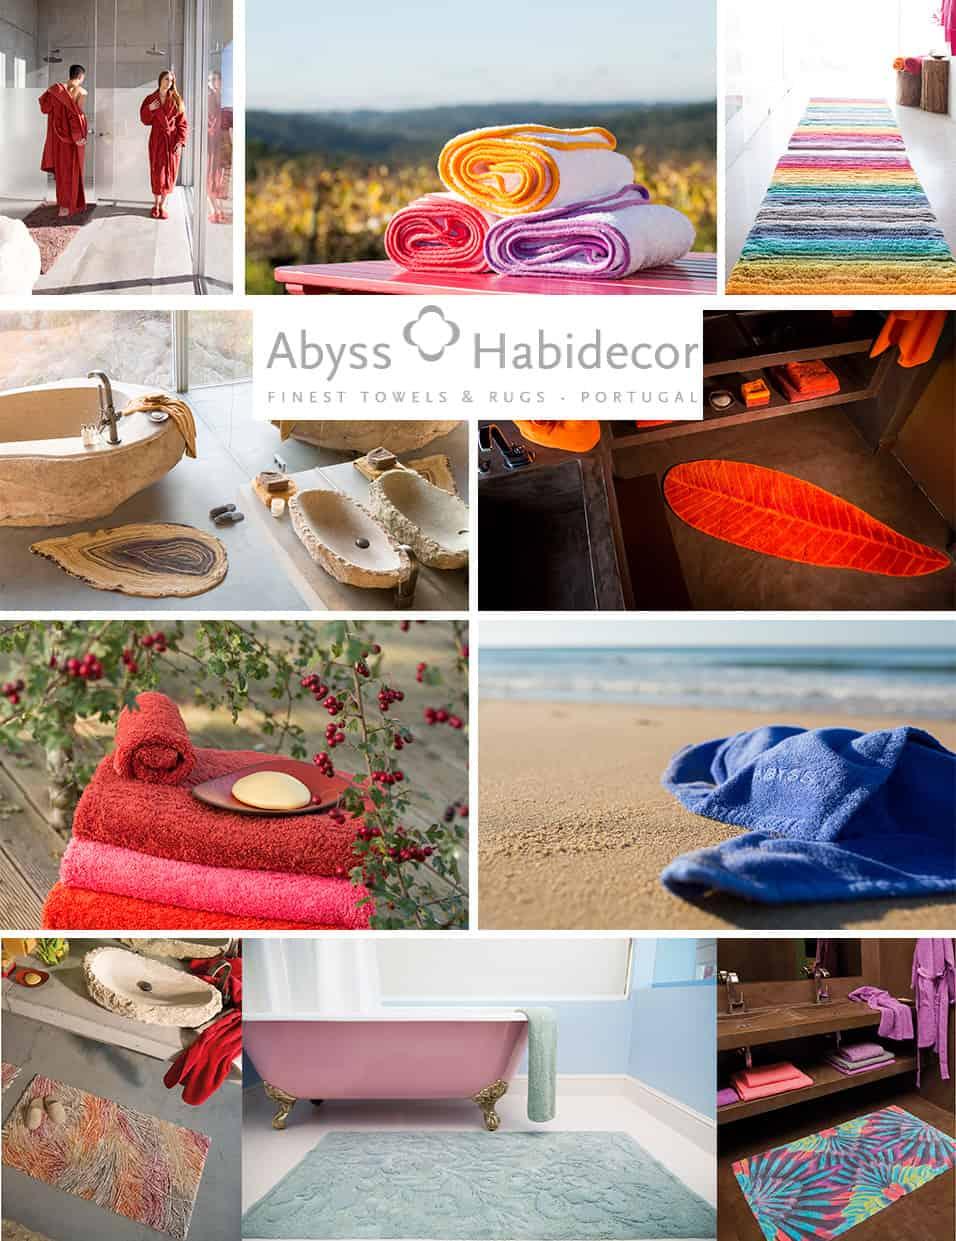 ABYSS HABIDECOR handdoeken